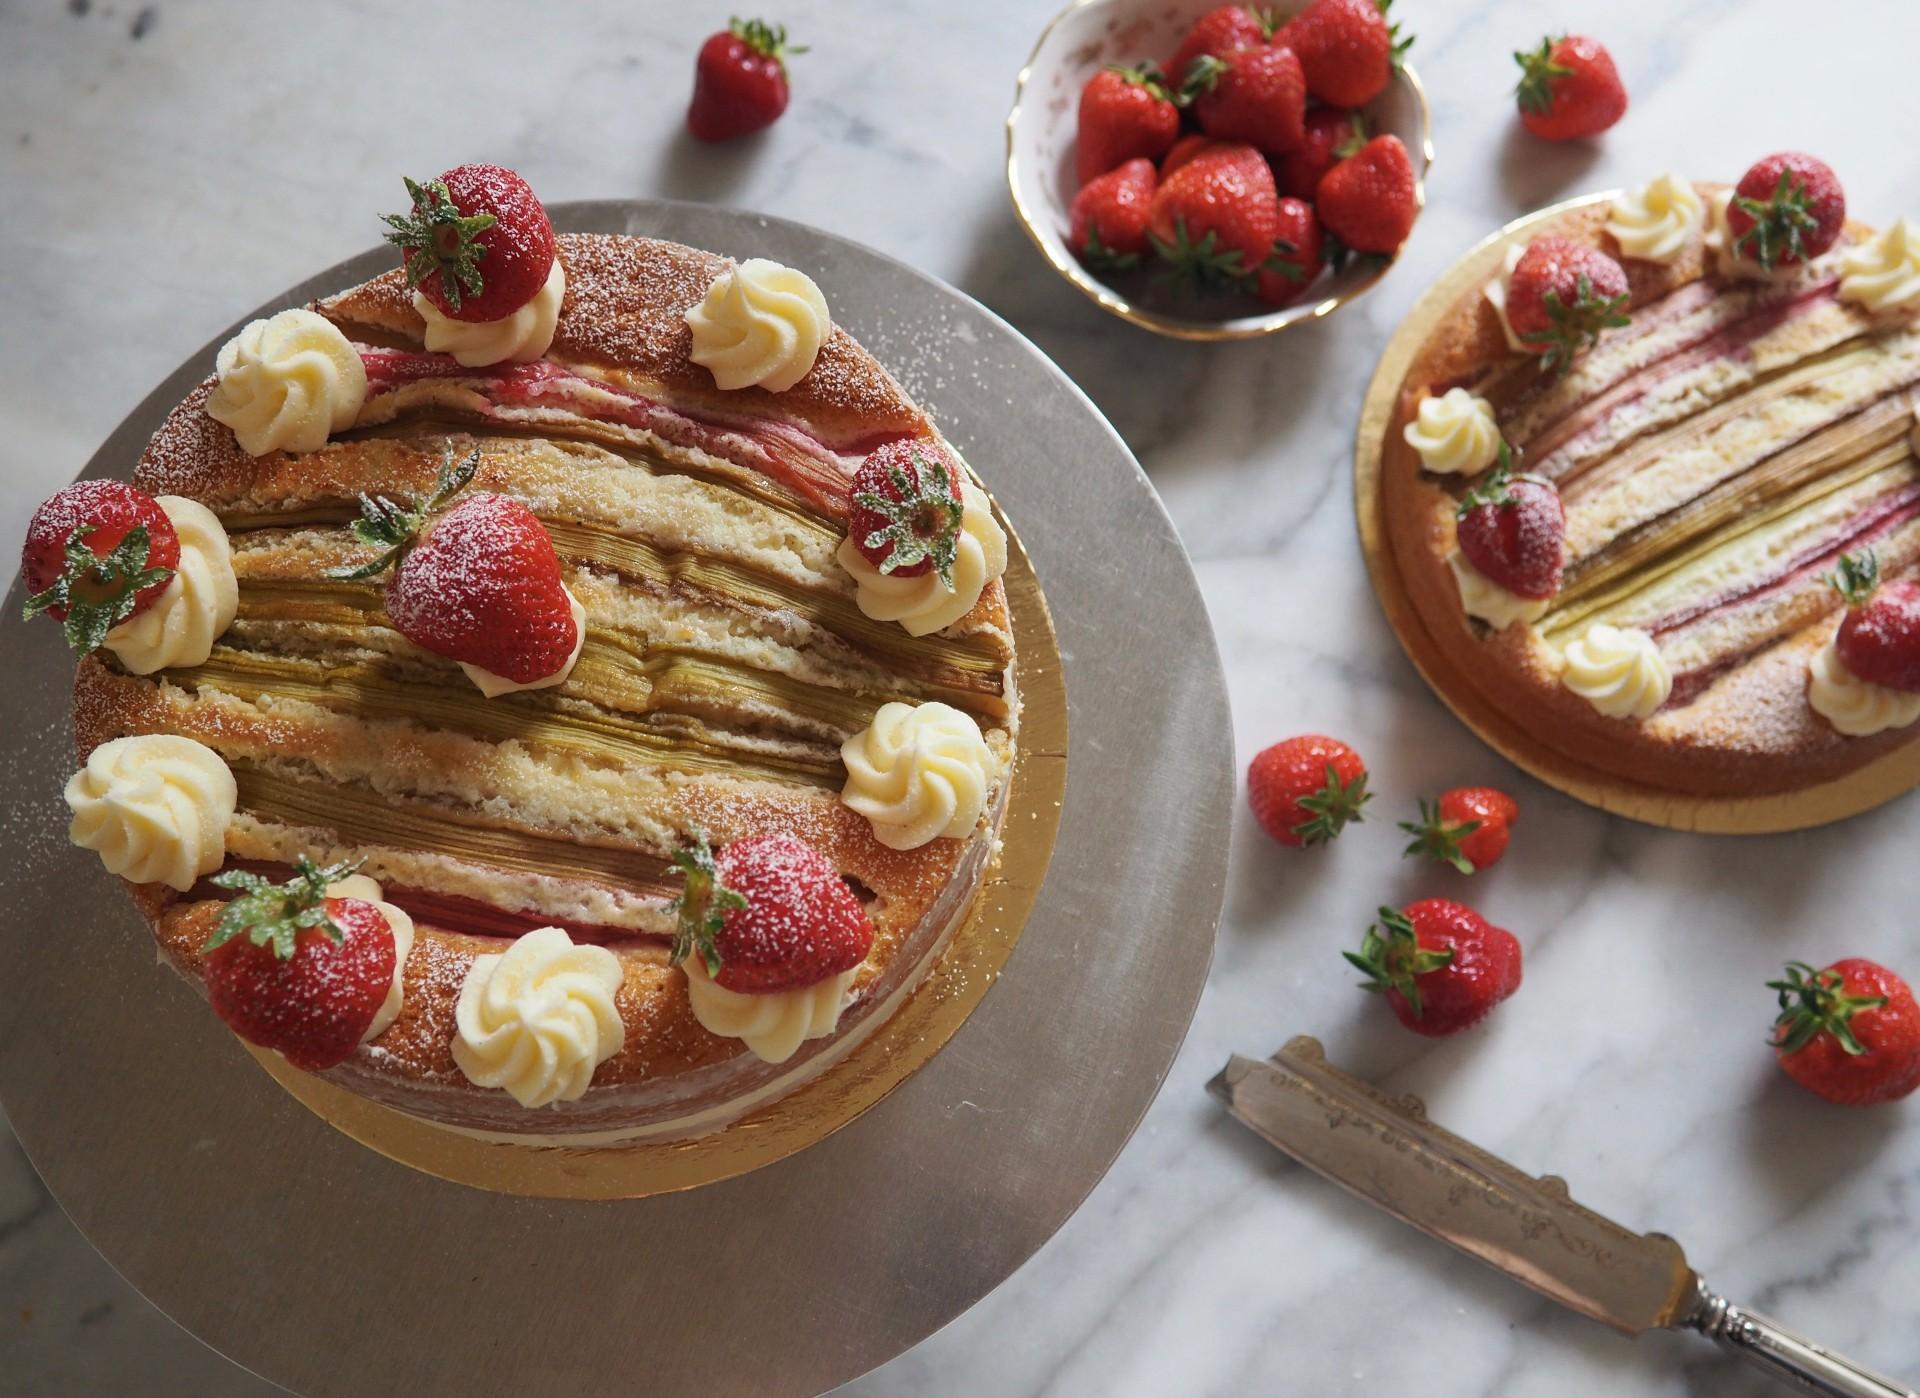 Rhubarb Stripe Cake with Lemon and Ginger